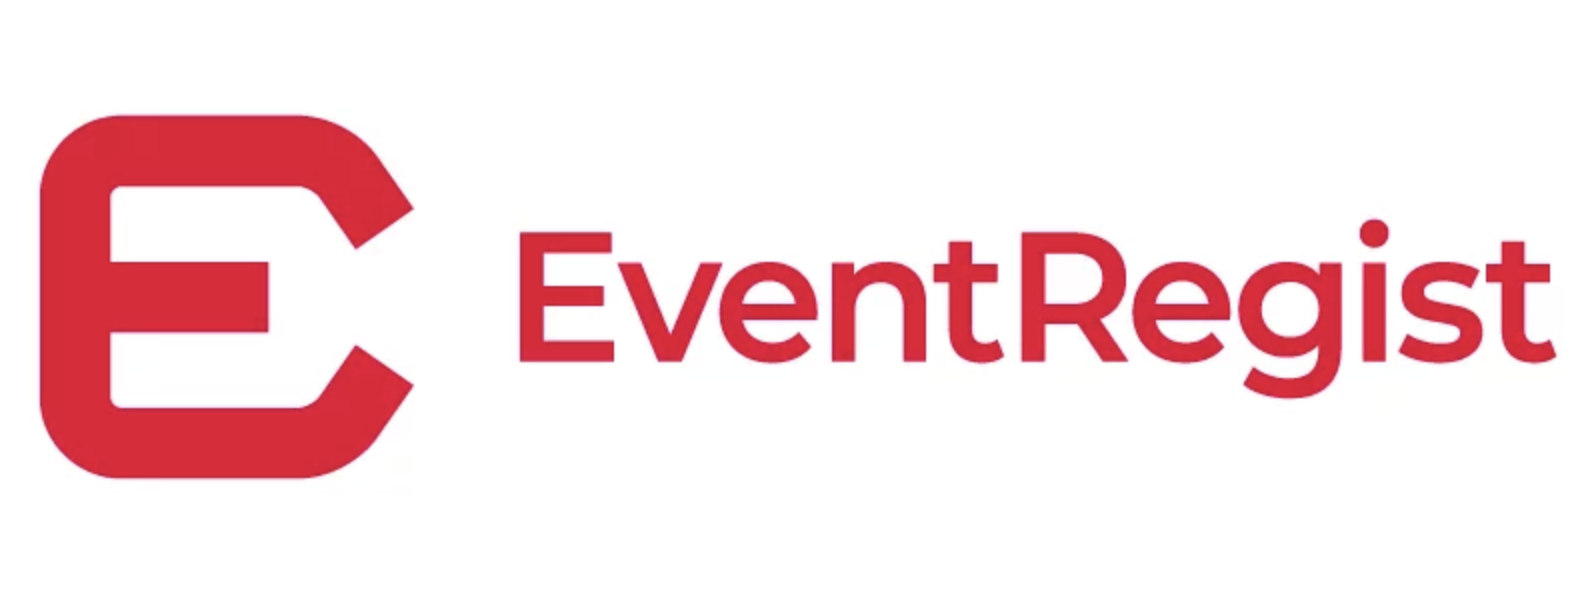 eventregist.png